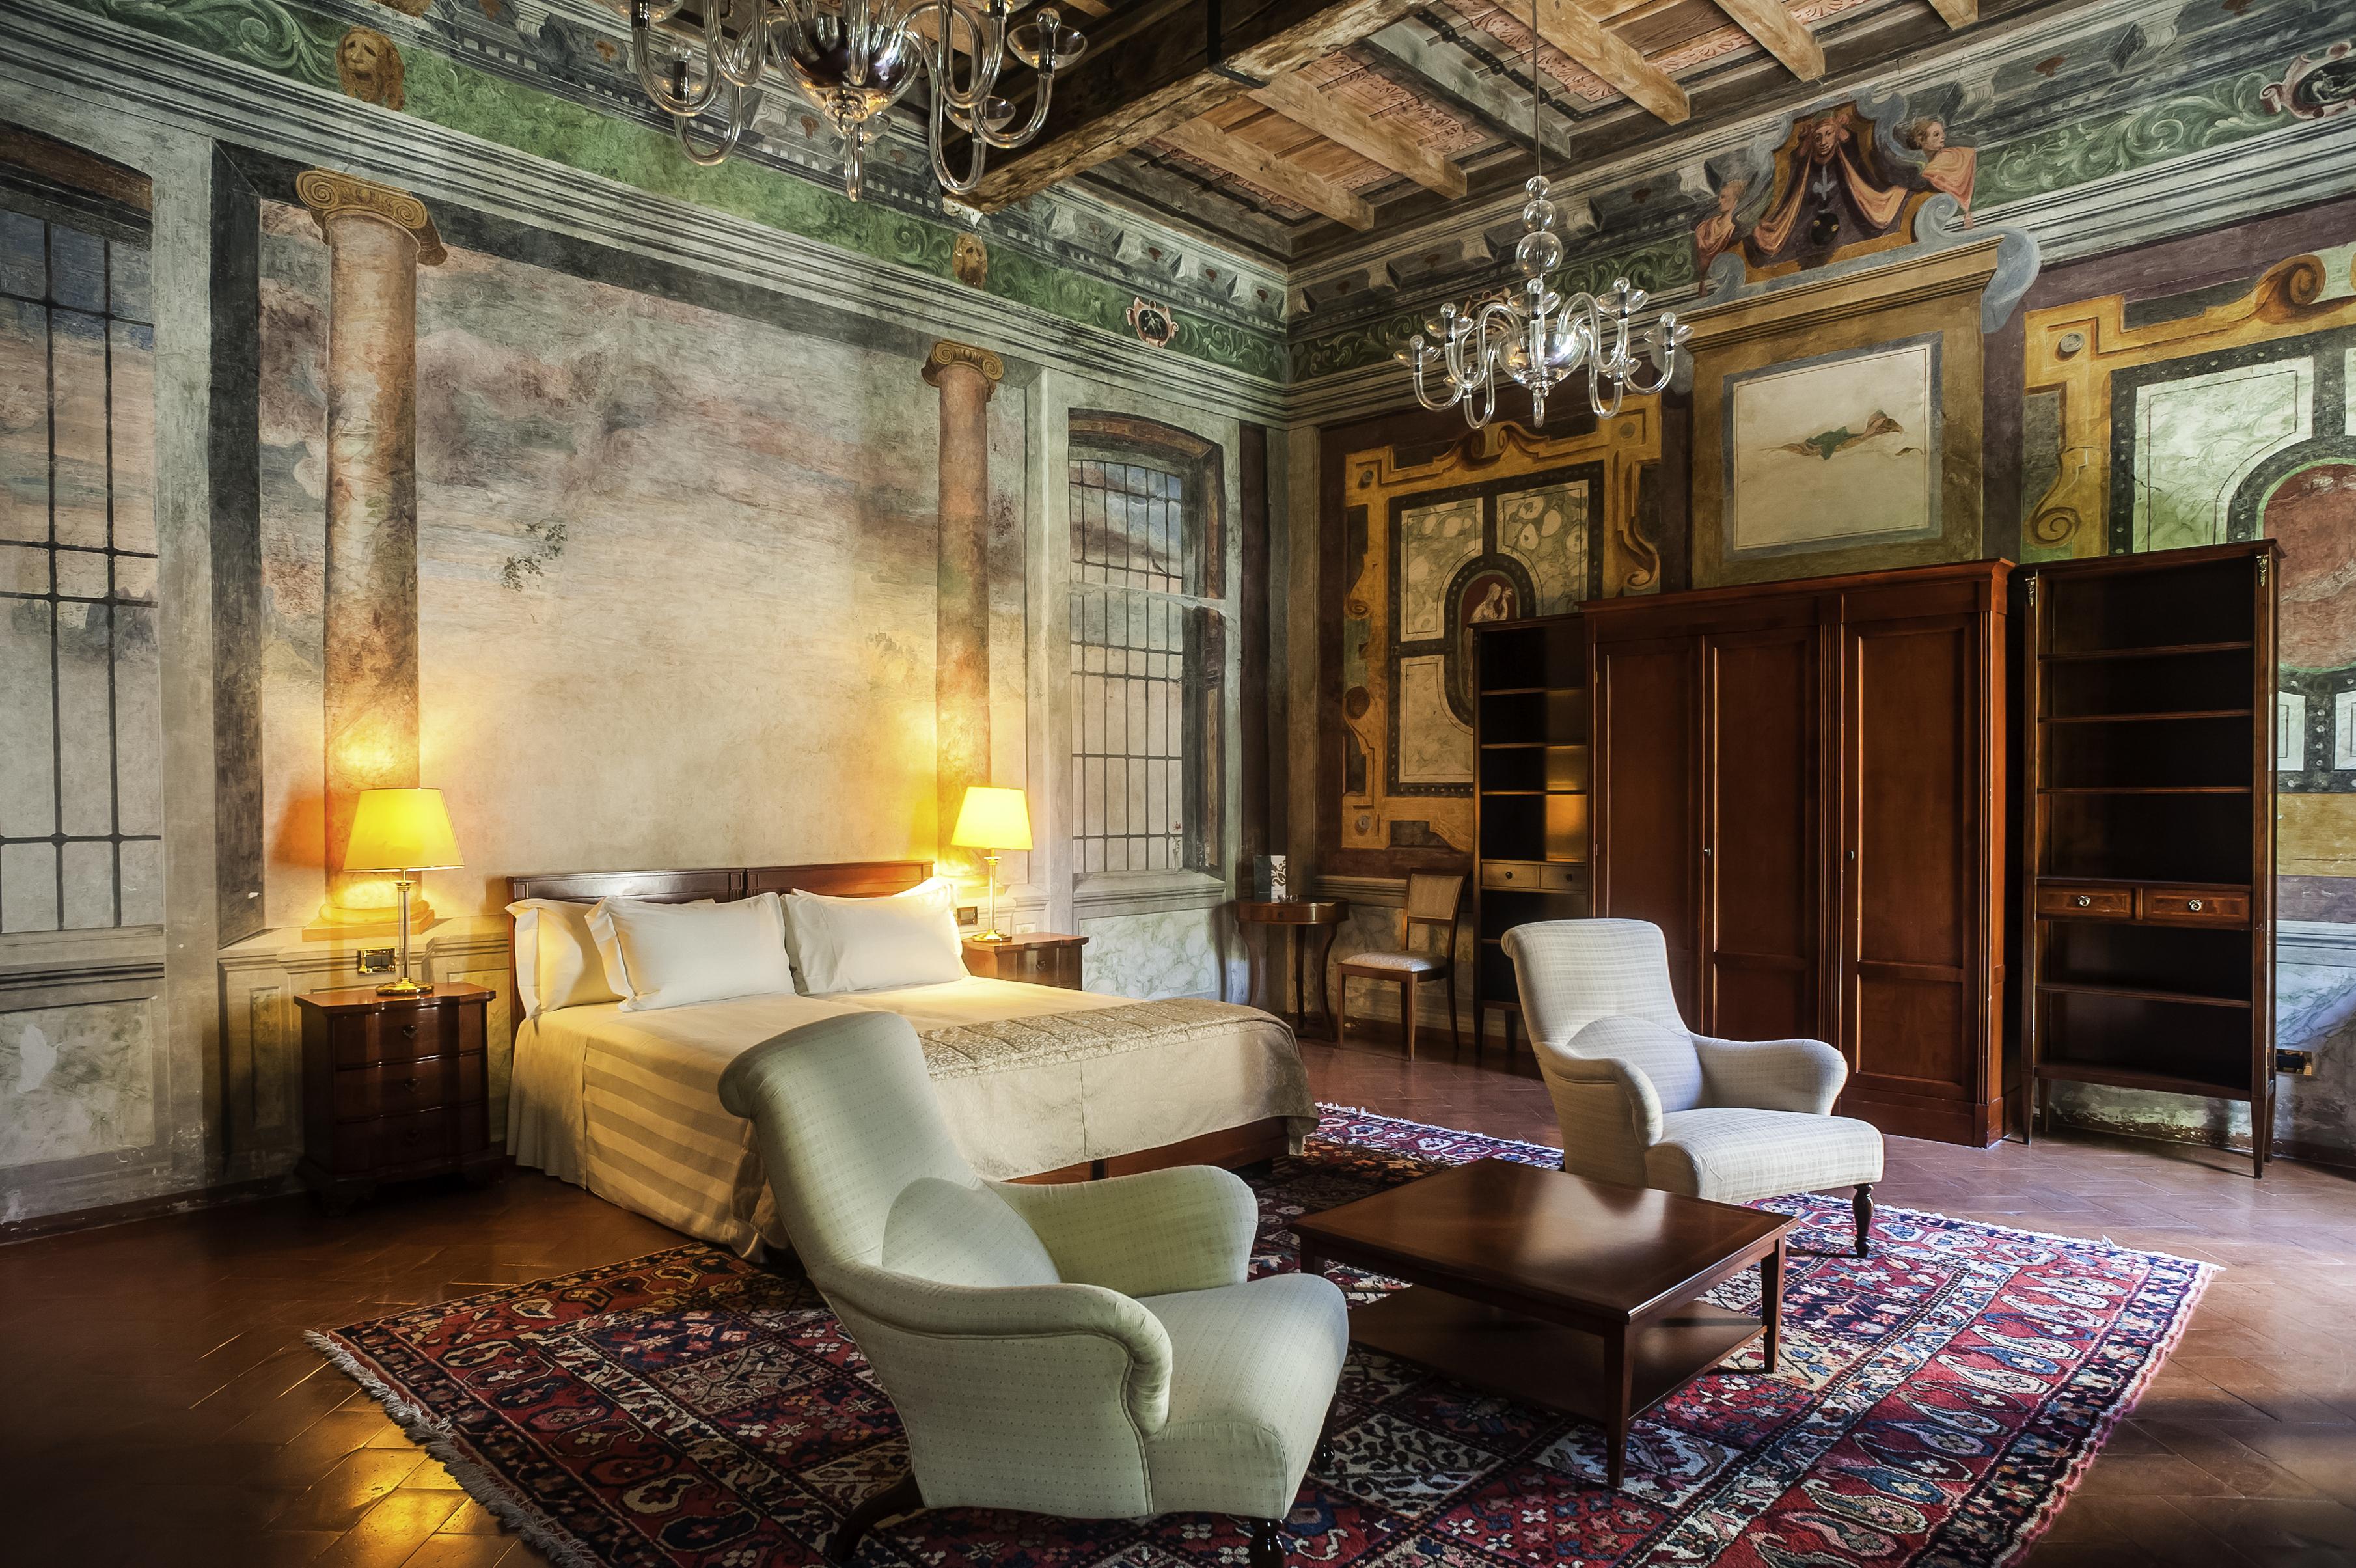 Grand Hotel Villa Torretta, una splendida suite affresata